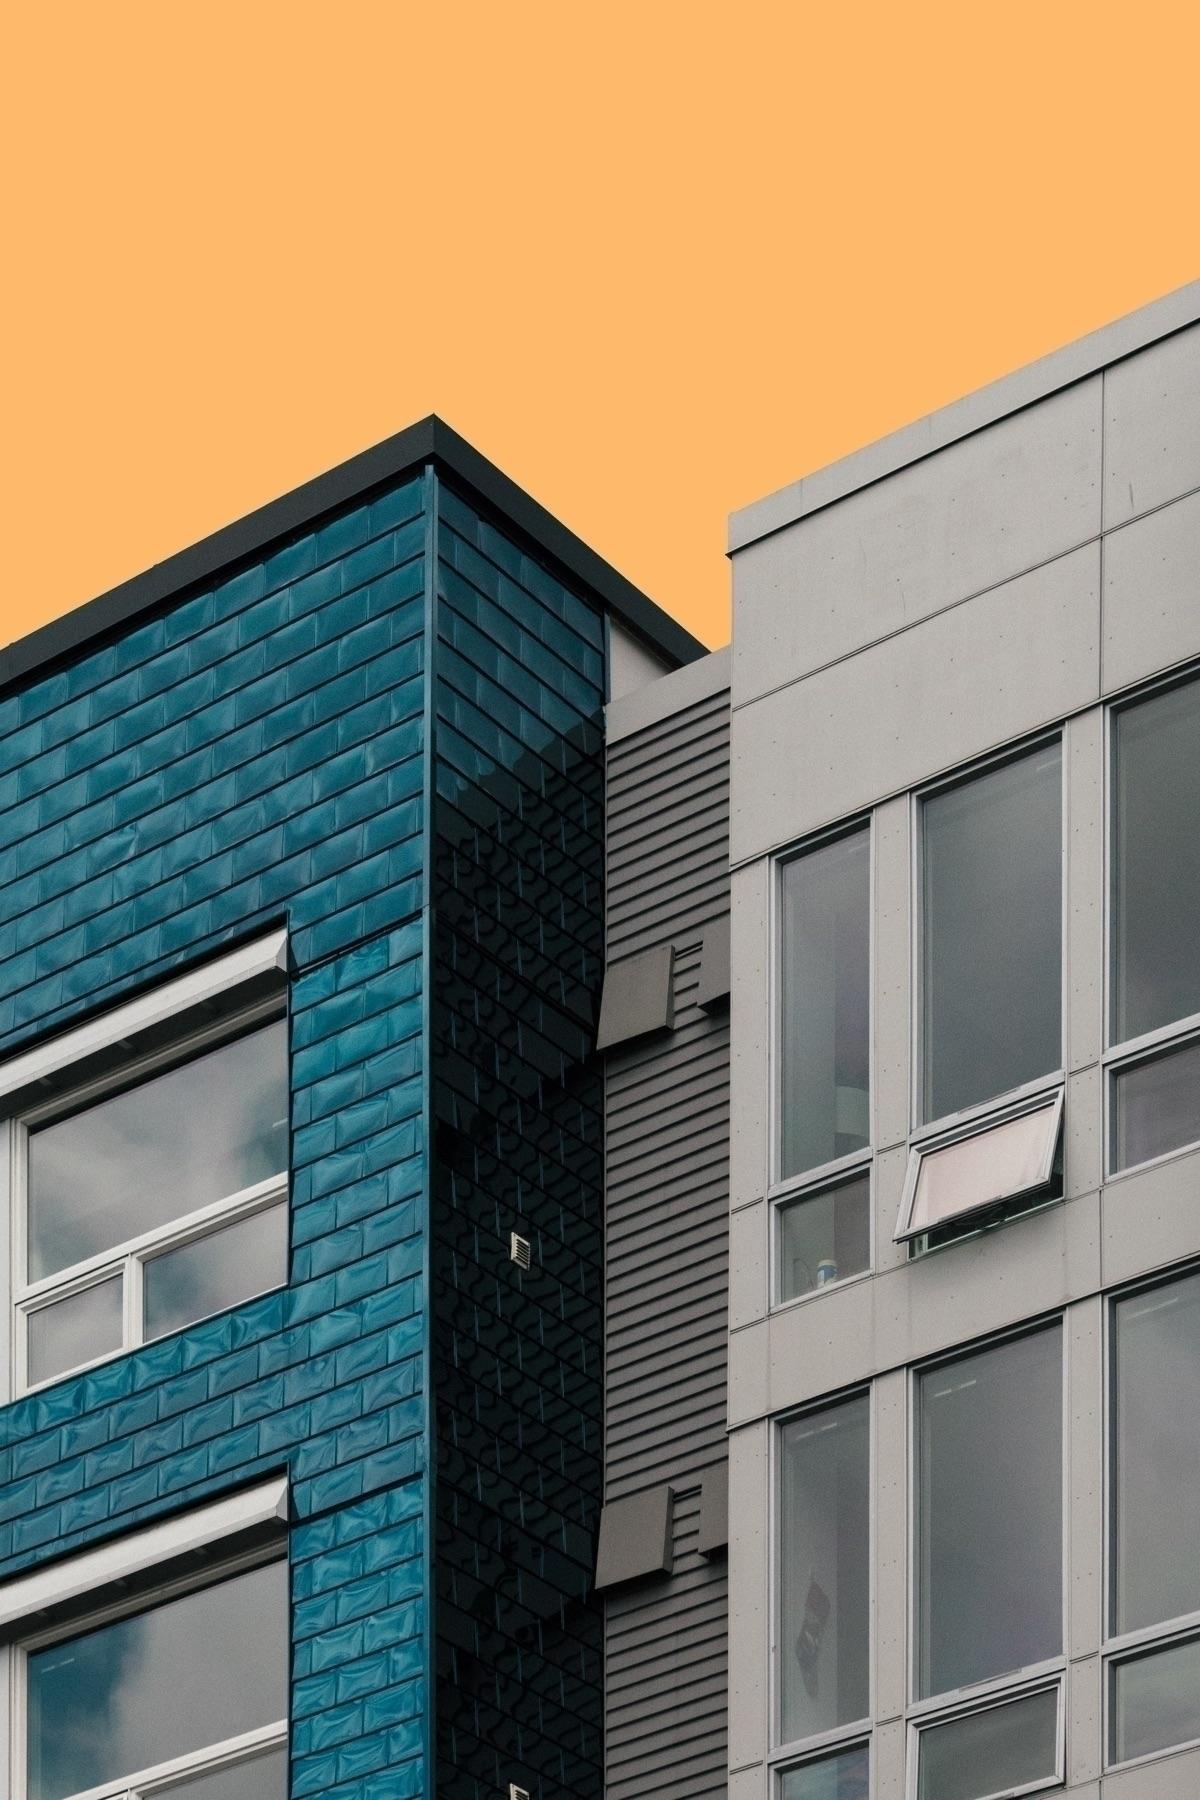 600 • vsco website - architecture - spookymatt | ello